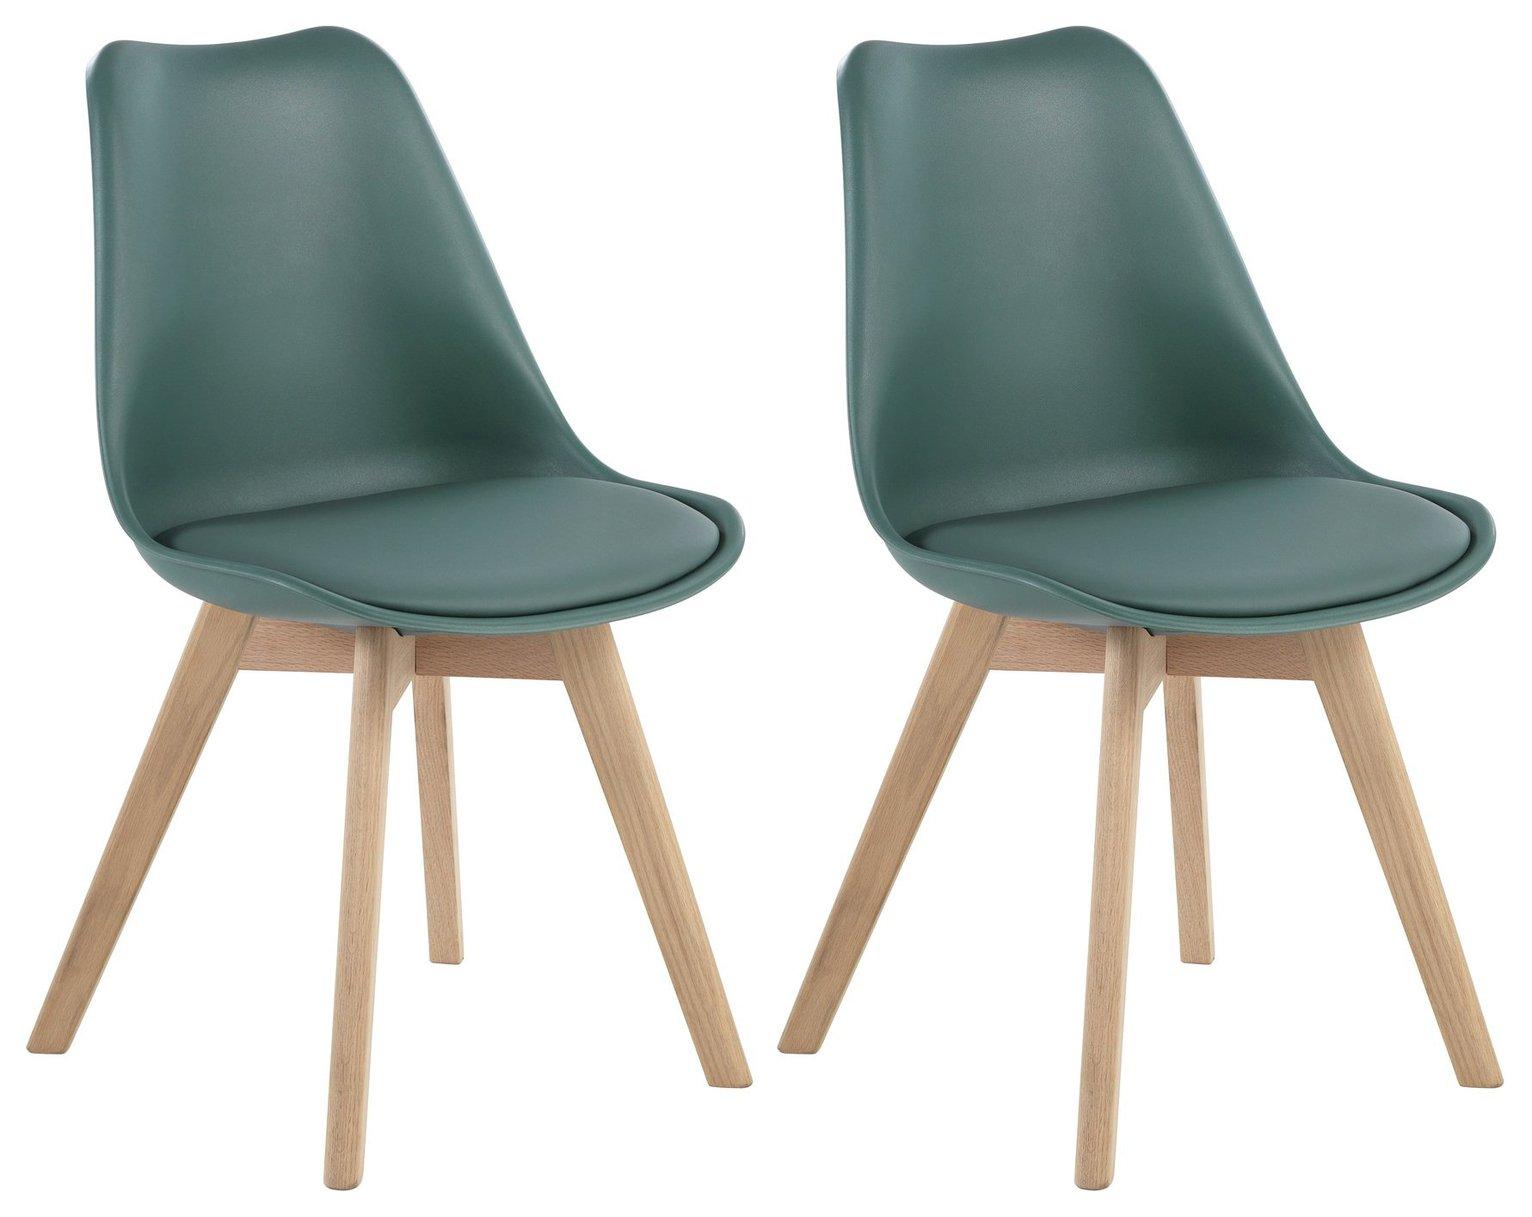 Habitat Jerry Pair of Dining Chairs - Dark Green  sc 1 st  Argos & Buy Habitat Jerry Pair of Dining Chairs - Dark Green   Dining chairs ...